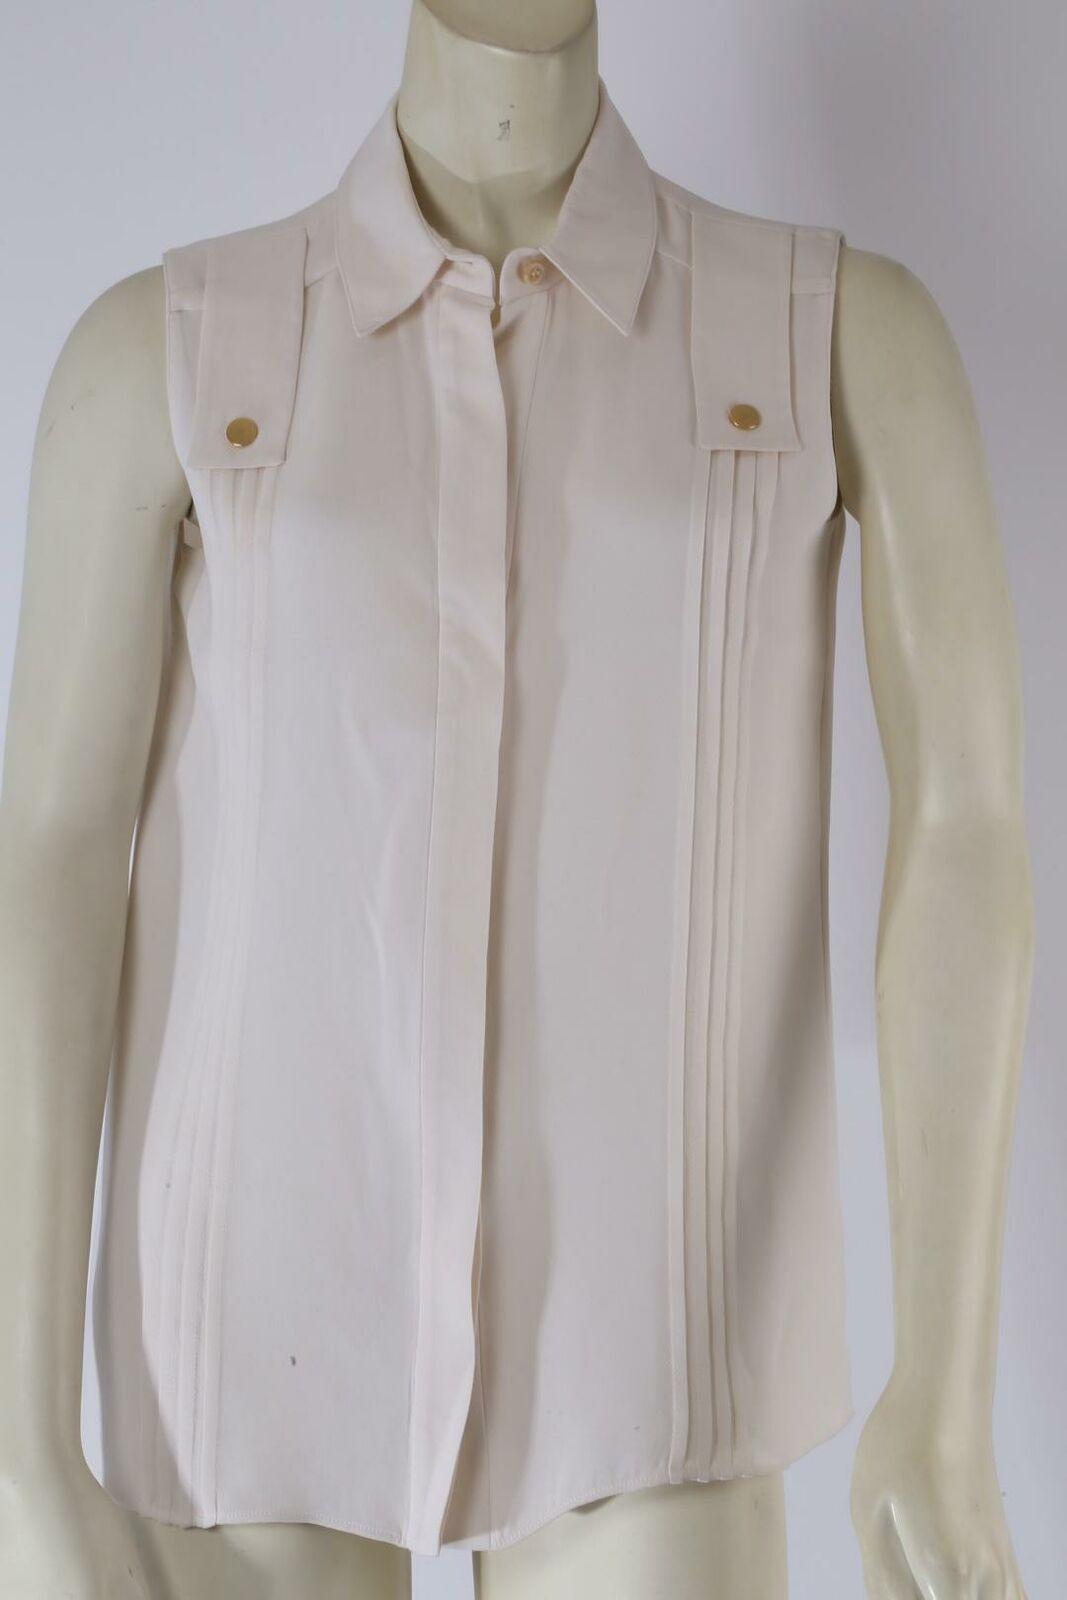 DEREK LAM Ivory Sleeveless Collared Silk Pleated … - image 3